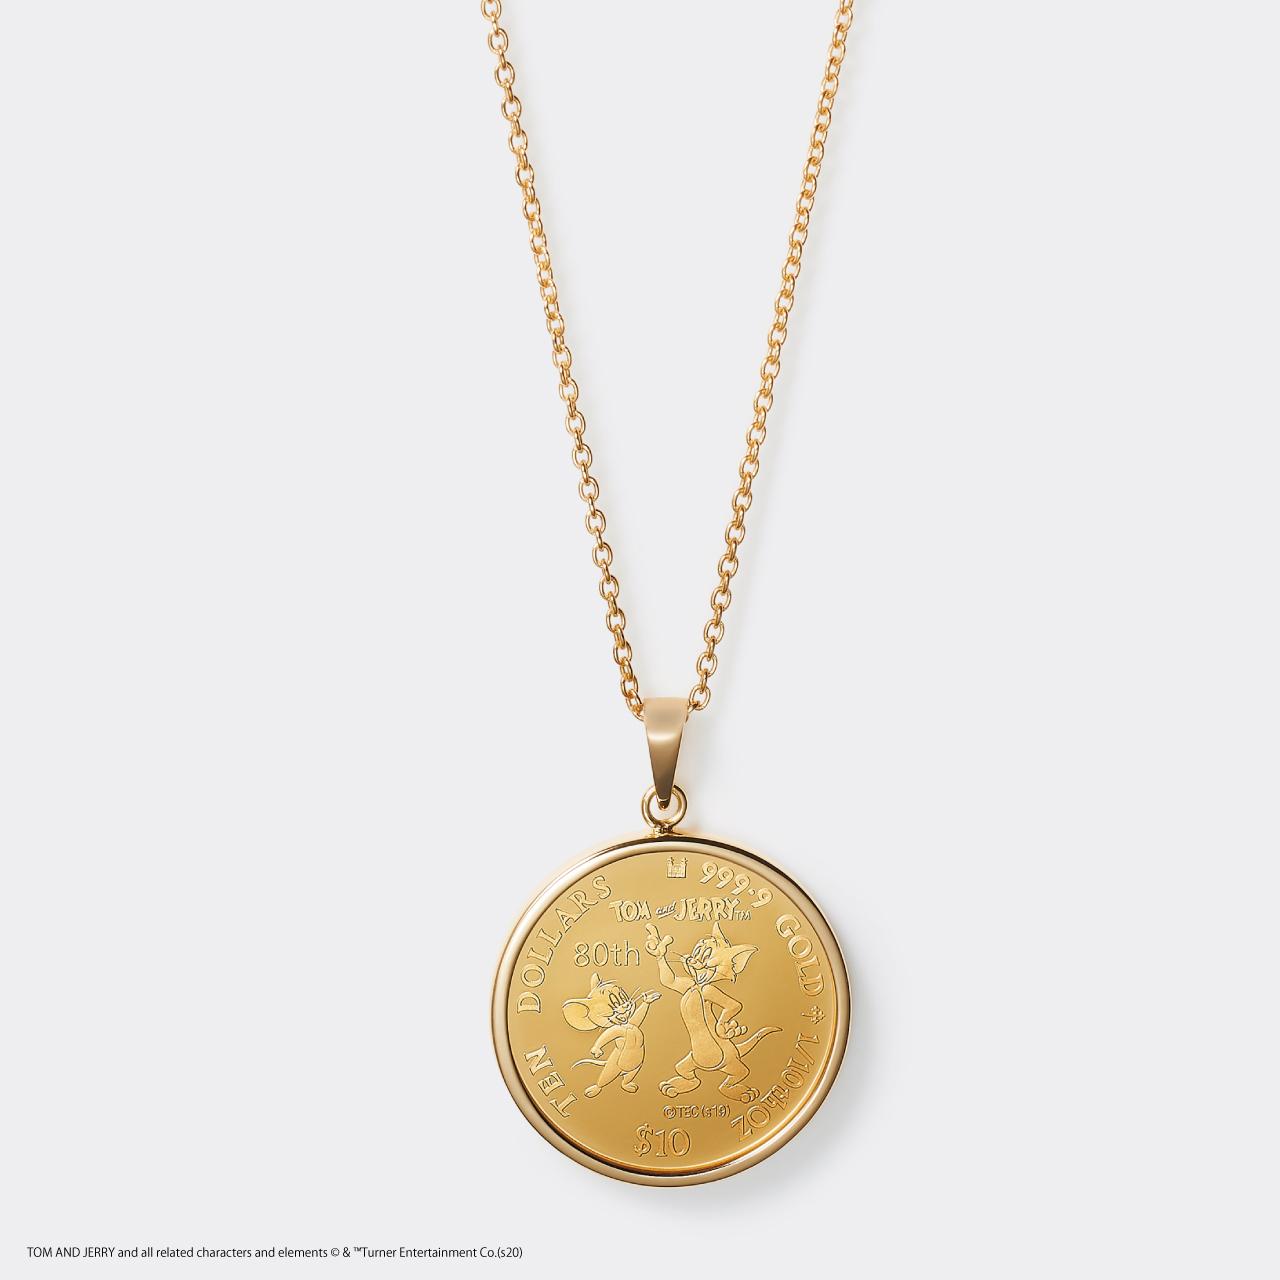 2020 TOM&JERRY 1/10 GOLD PROOF COIN NECKLACE(トムとジェリー 80周年記念硬貨ネックレス 1/10オンス)